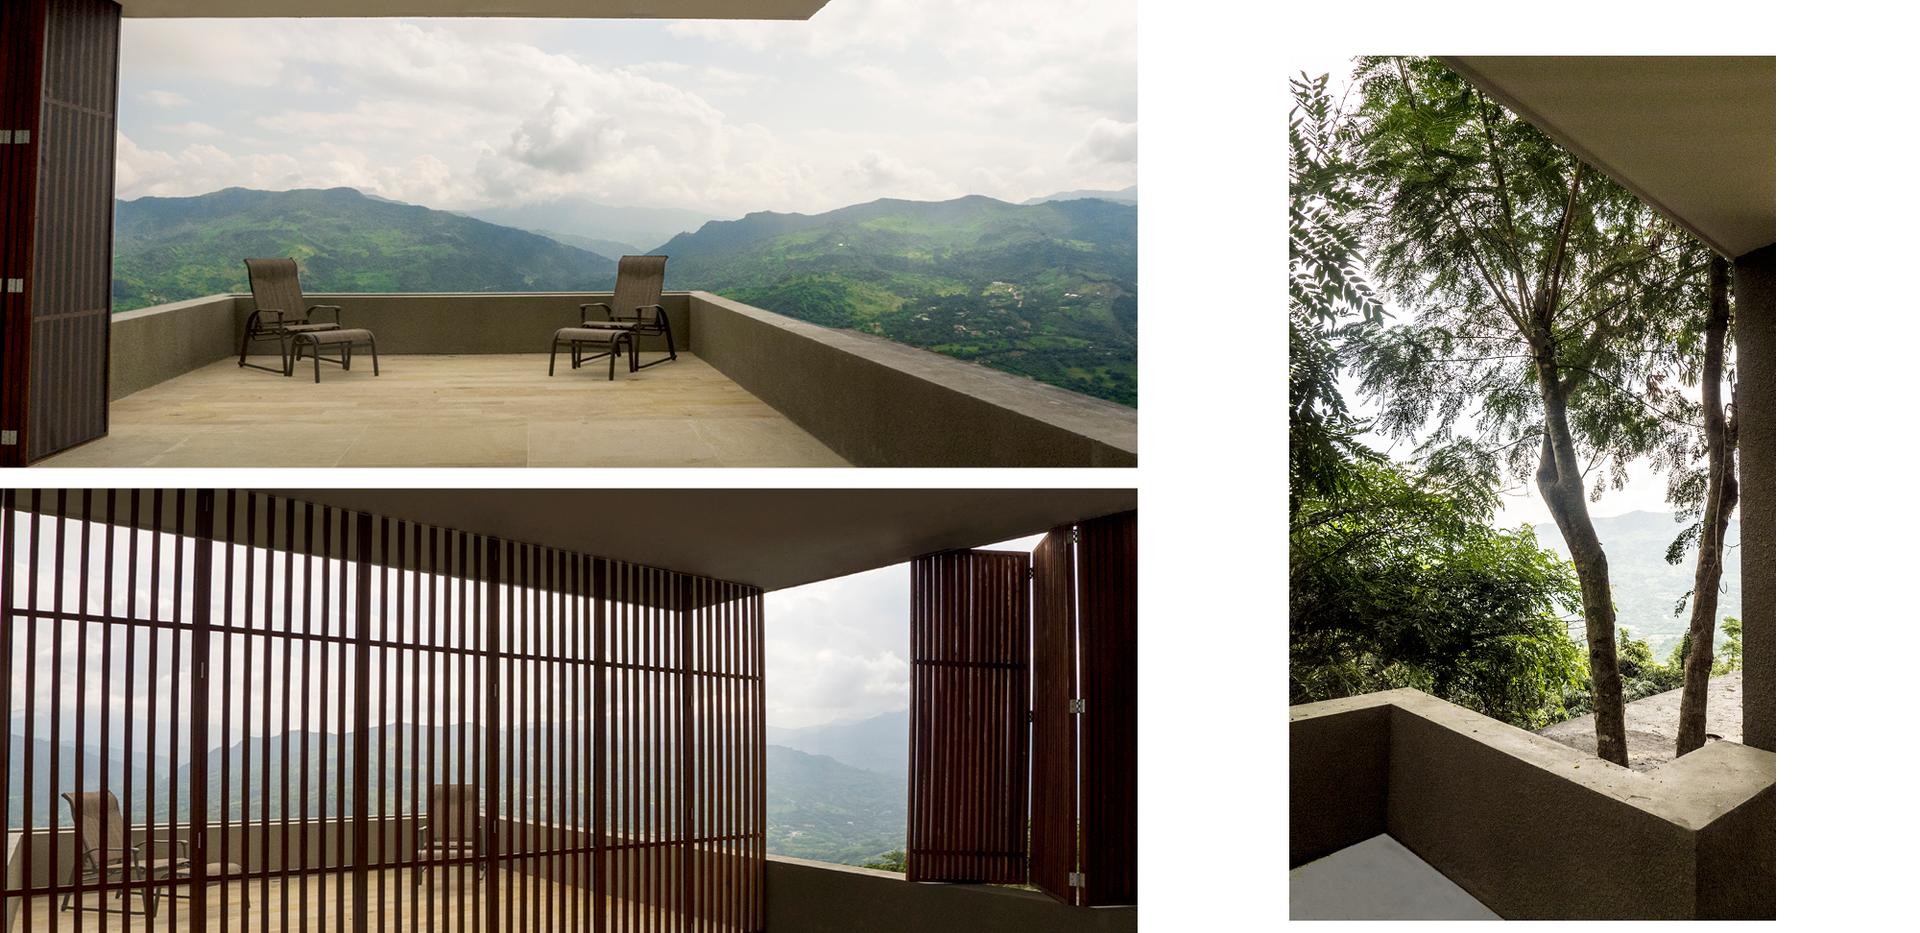 Villas Payande_Andres Arias_Pico Velasquez-6